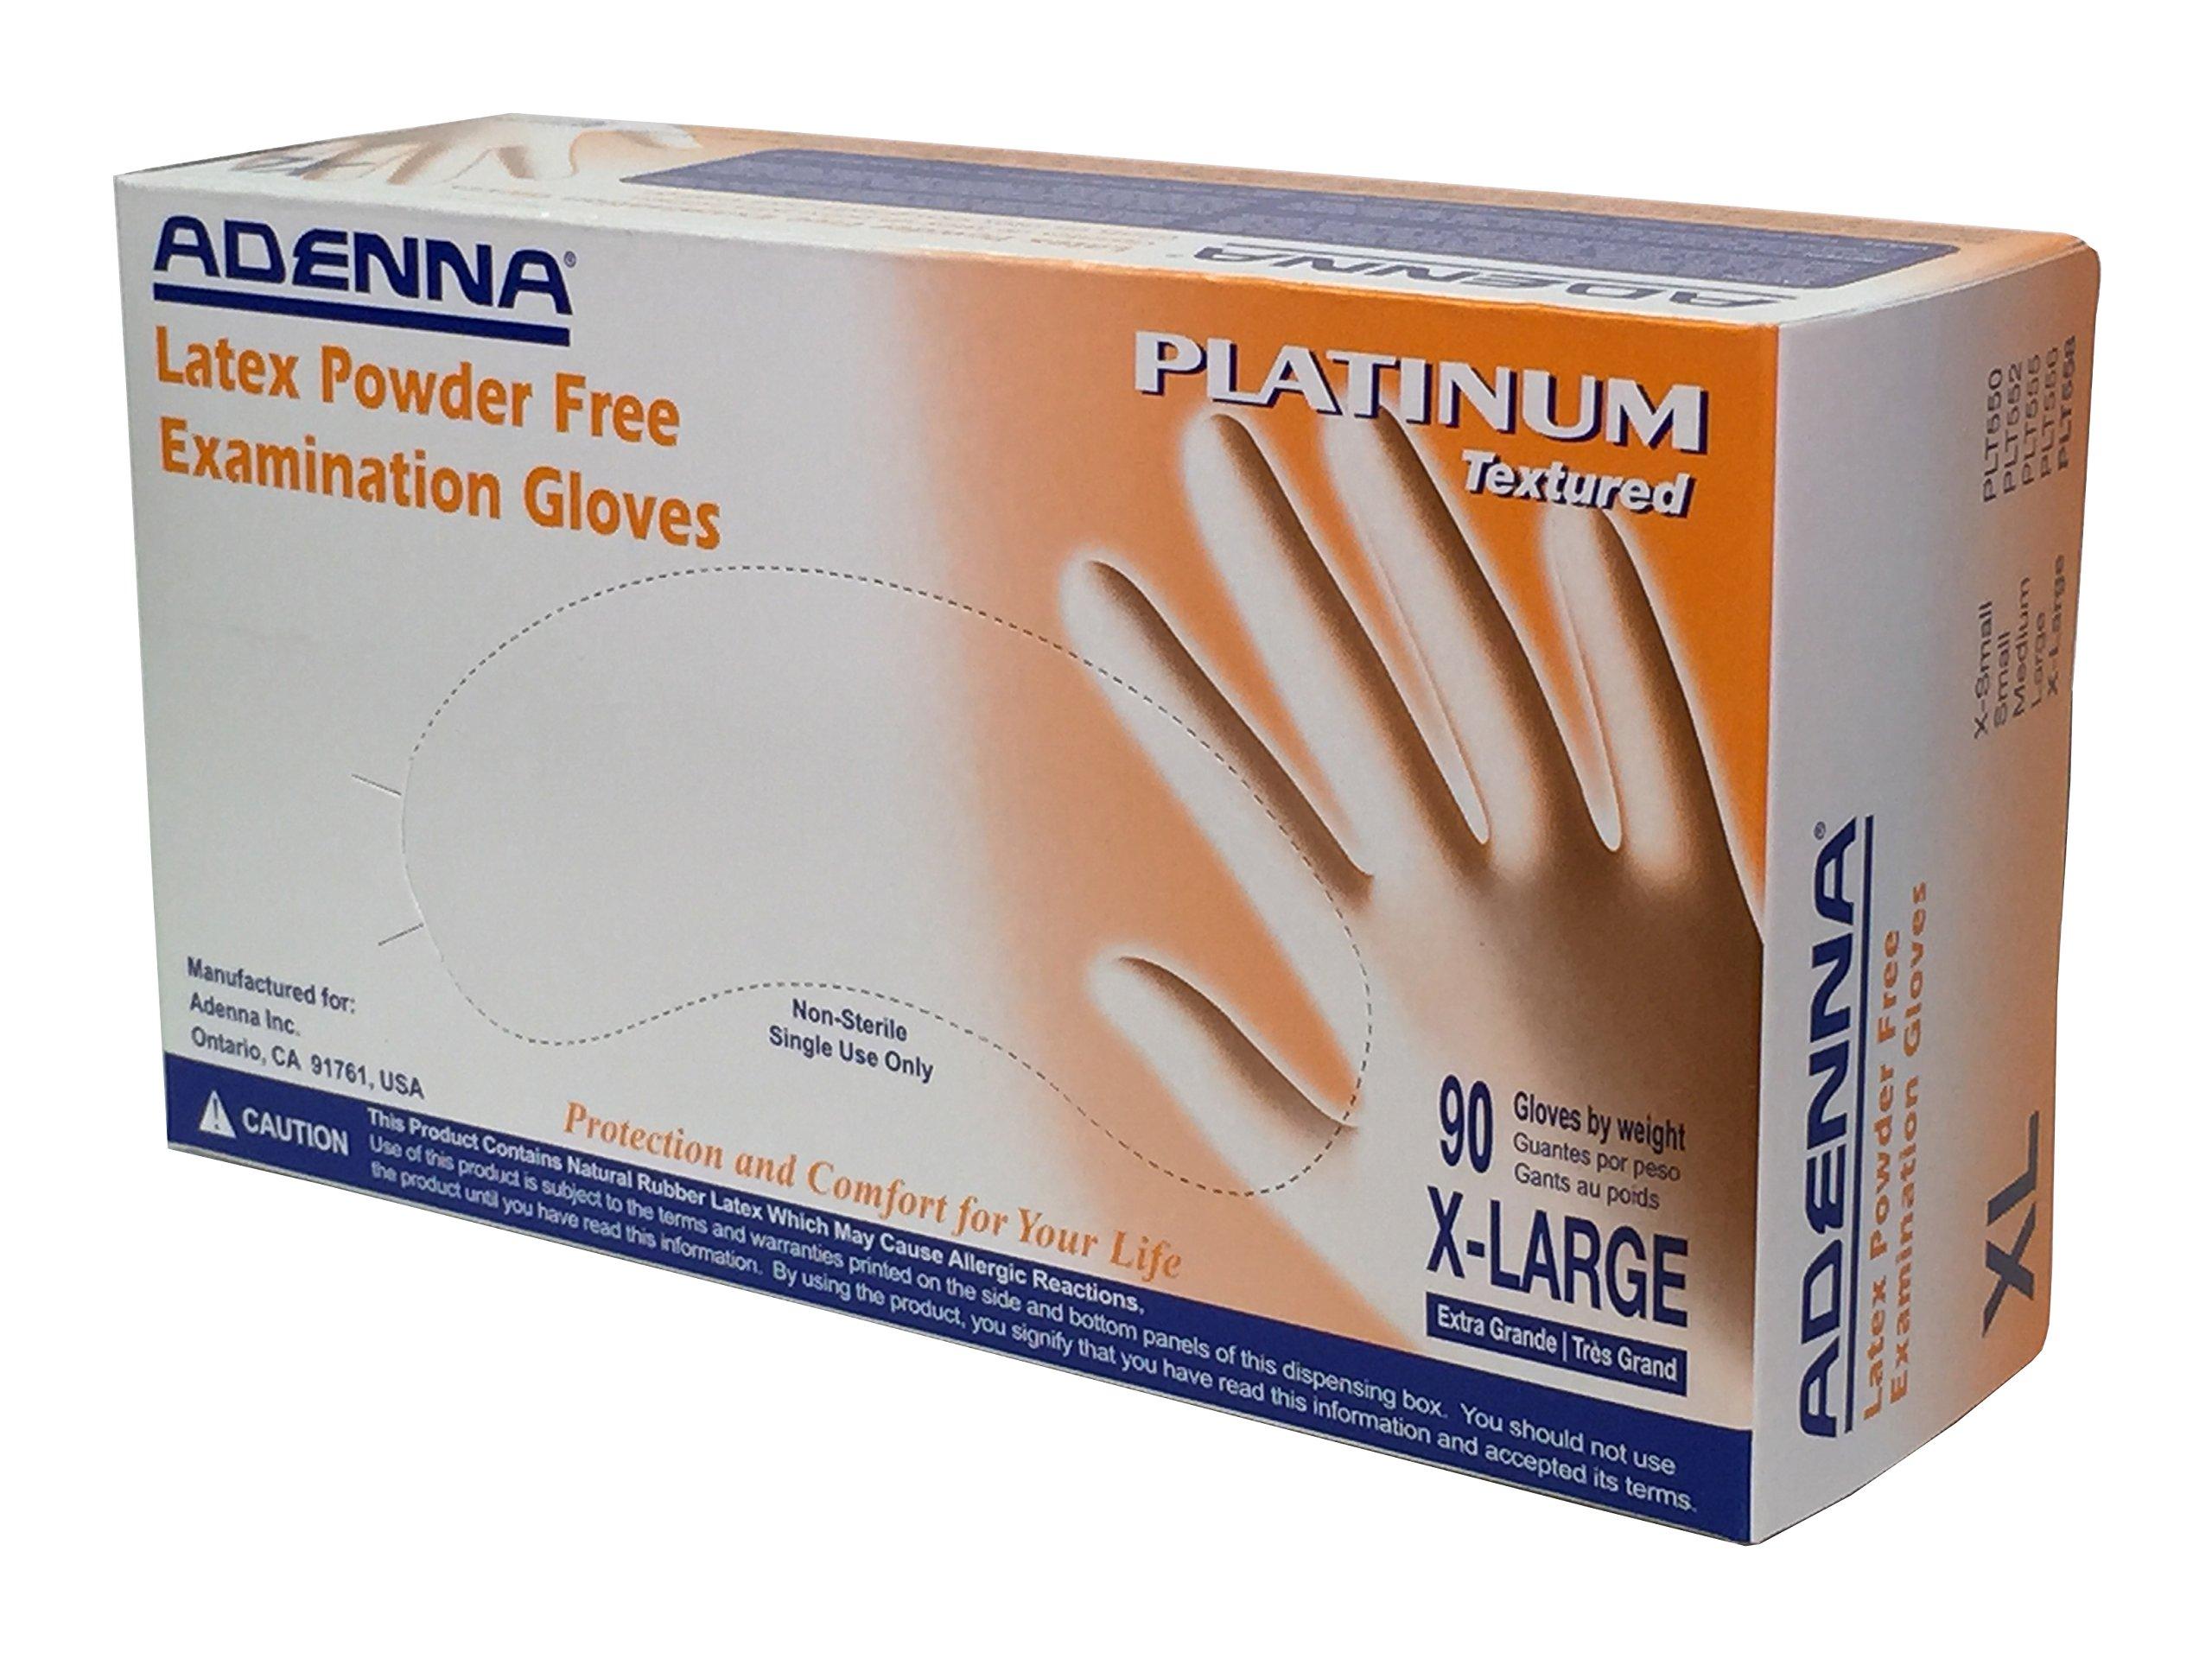 Adenna Platinum 5.5 mil Latex Powder Free Exam Gloves (White, X-Large) Box of 90